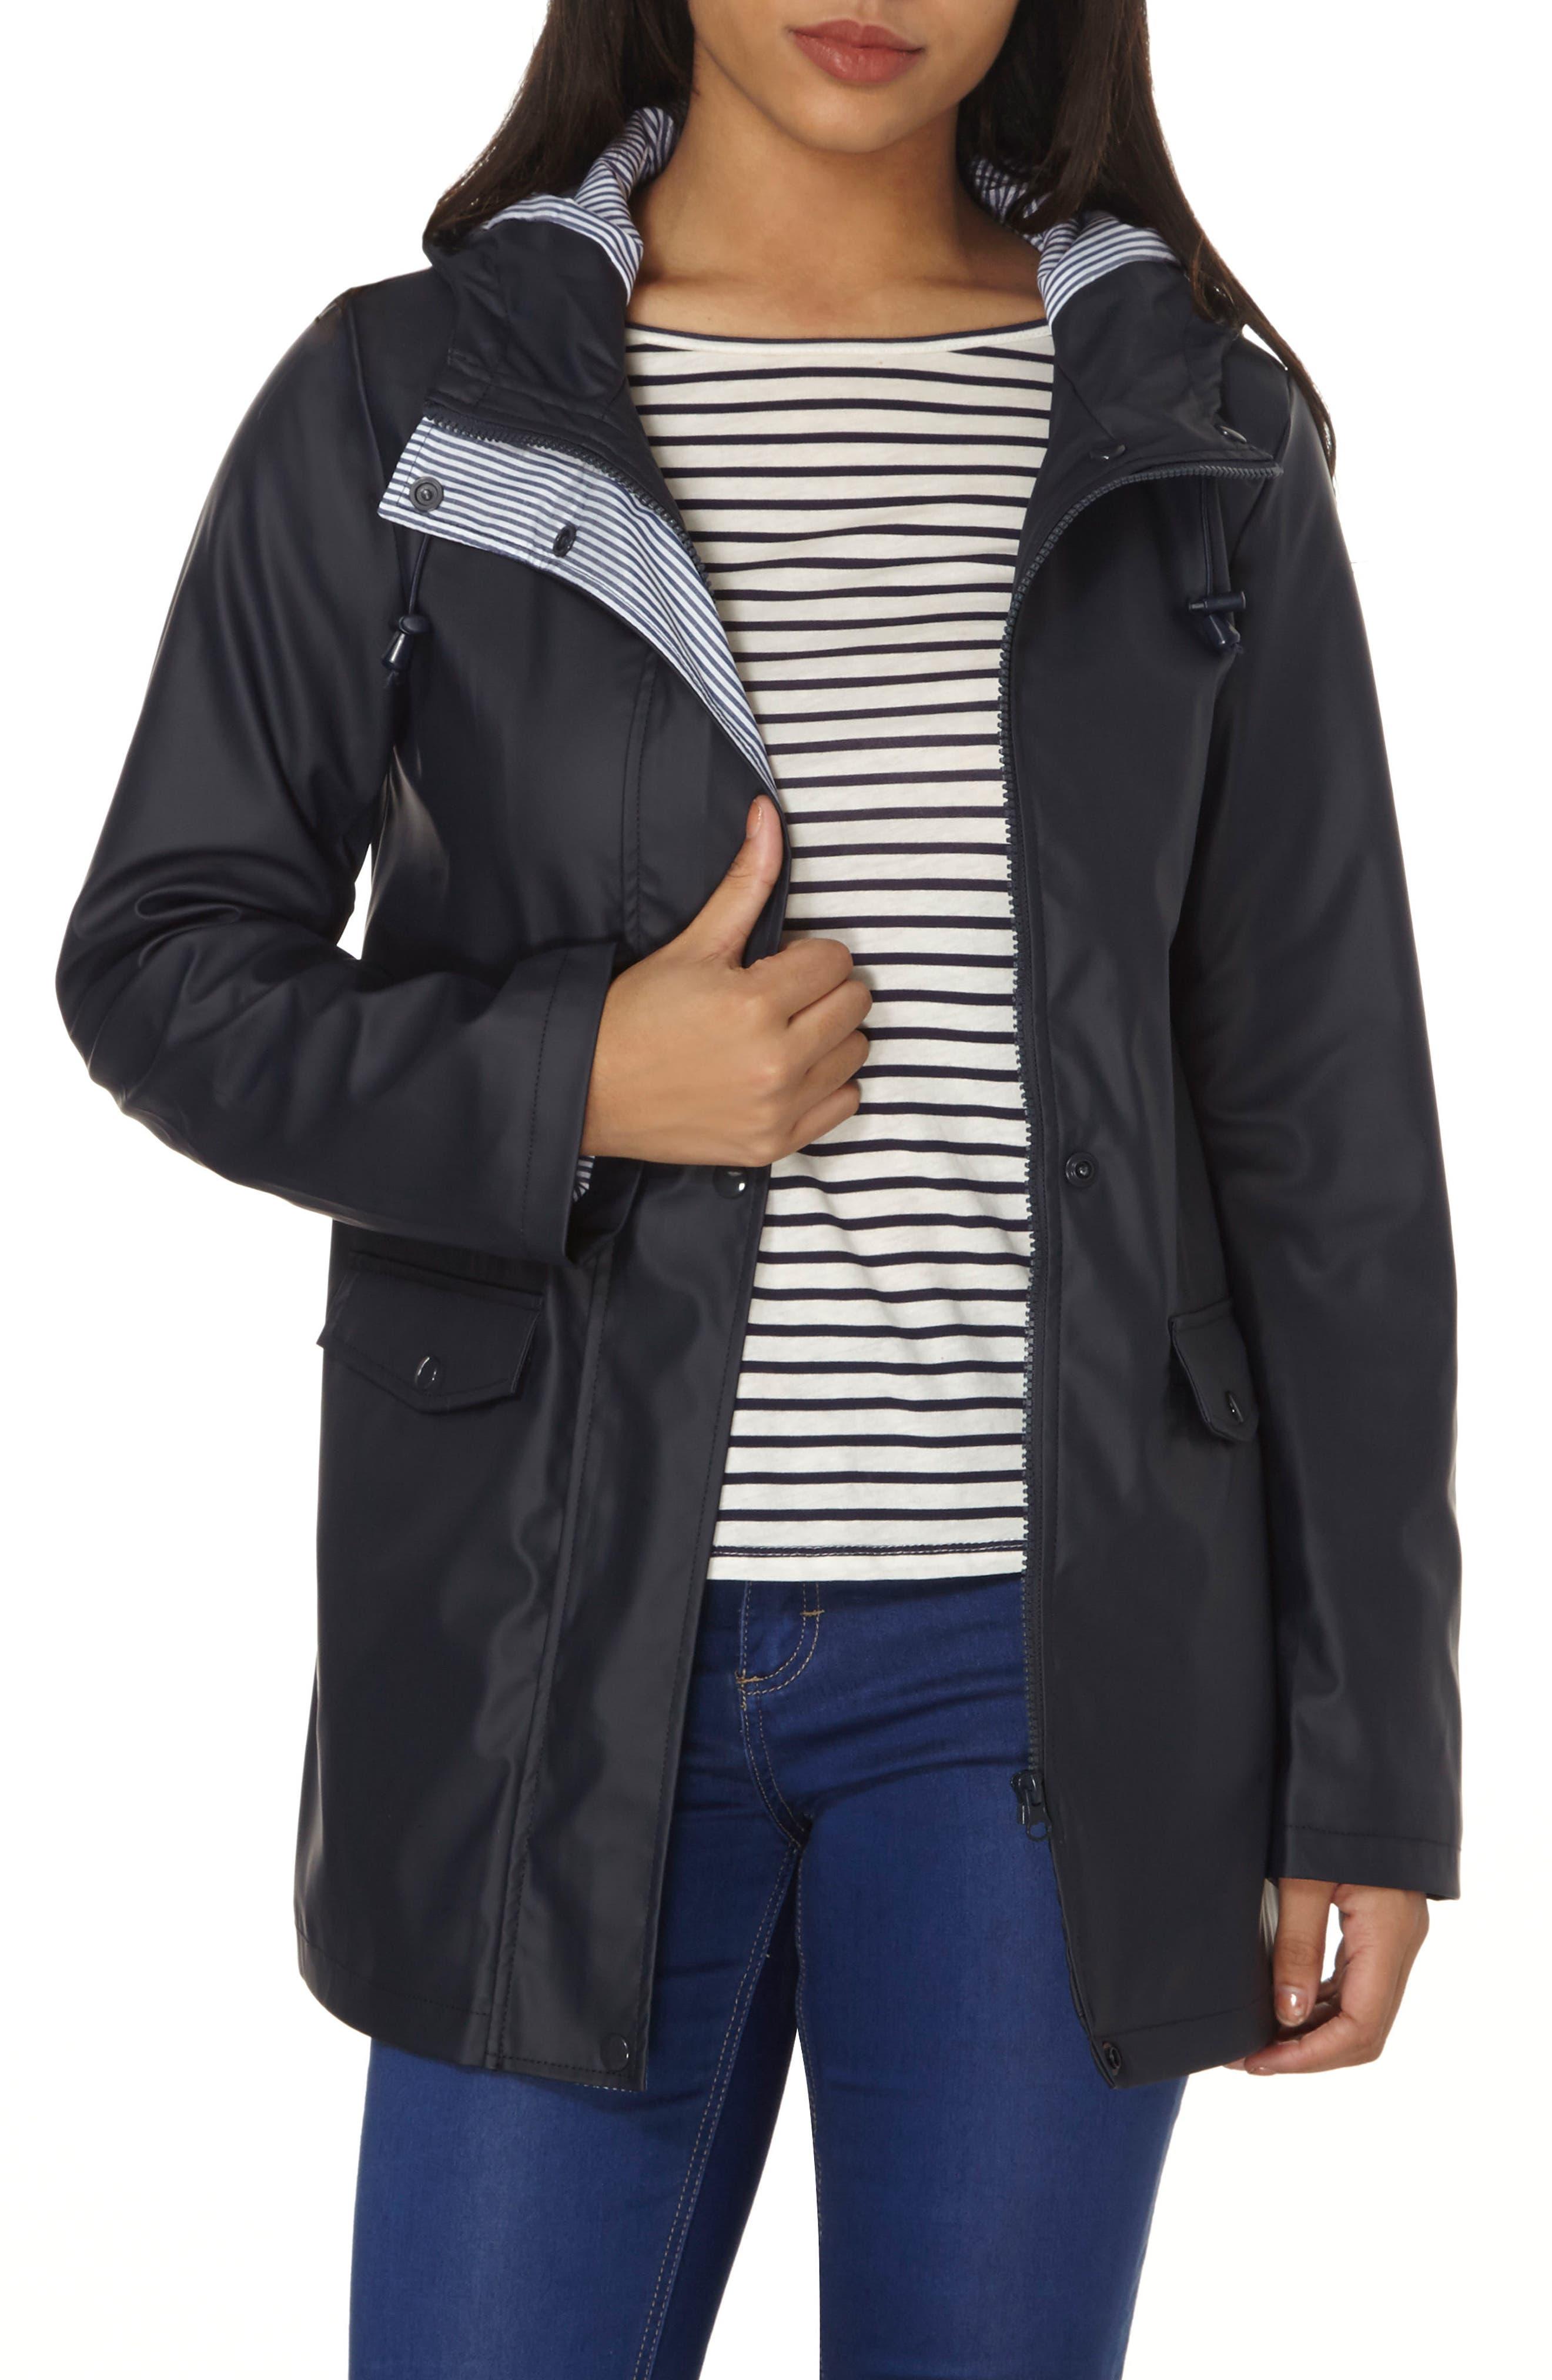 Hooded Rain Jacket,                             Main thumbnail 1, color,                             Navy Blue